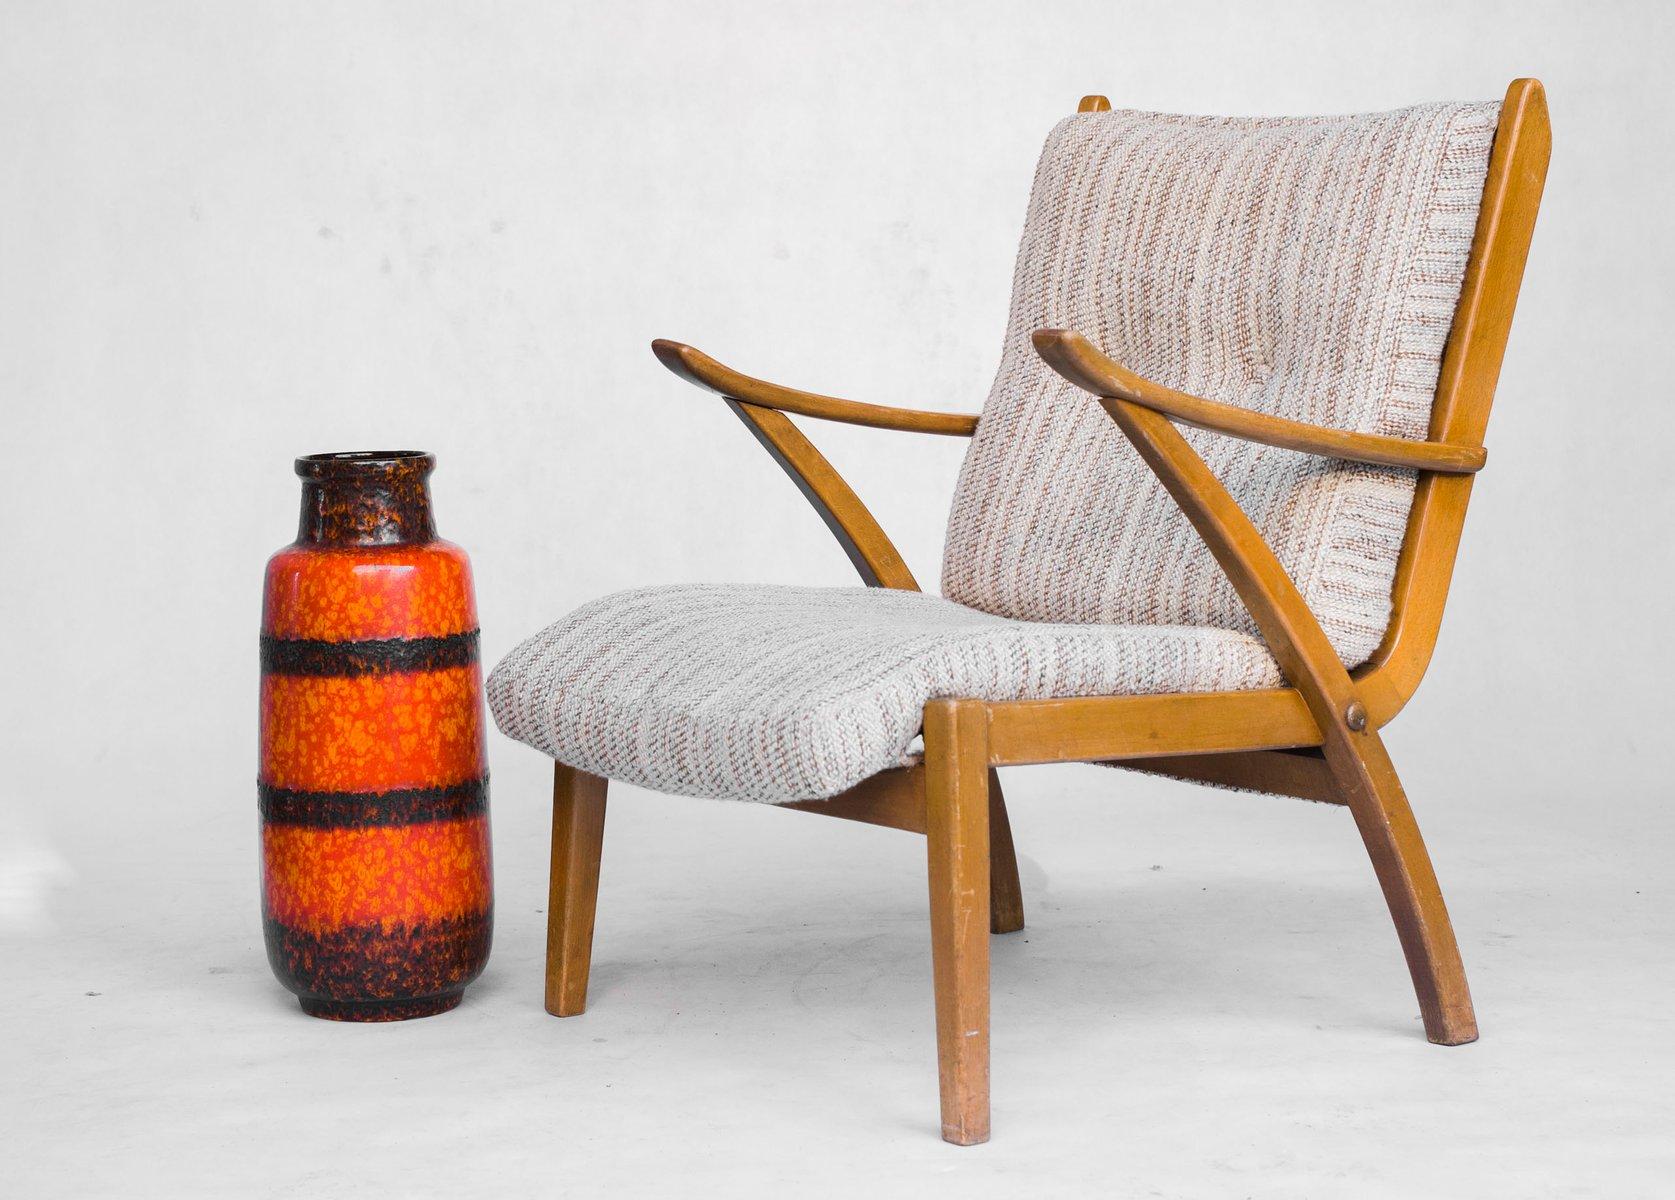 Vintage Molliperma Sessel von Möbelfabrik BSA, 1950er